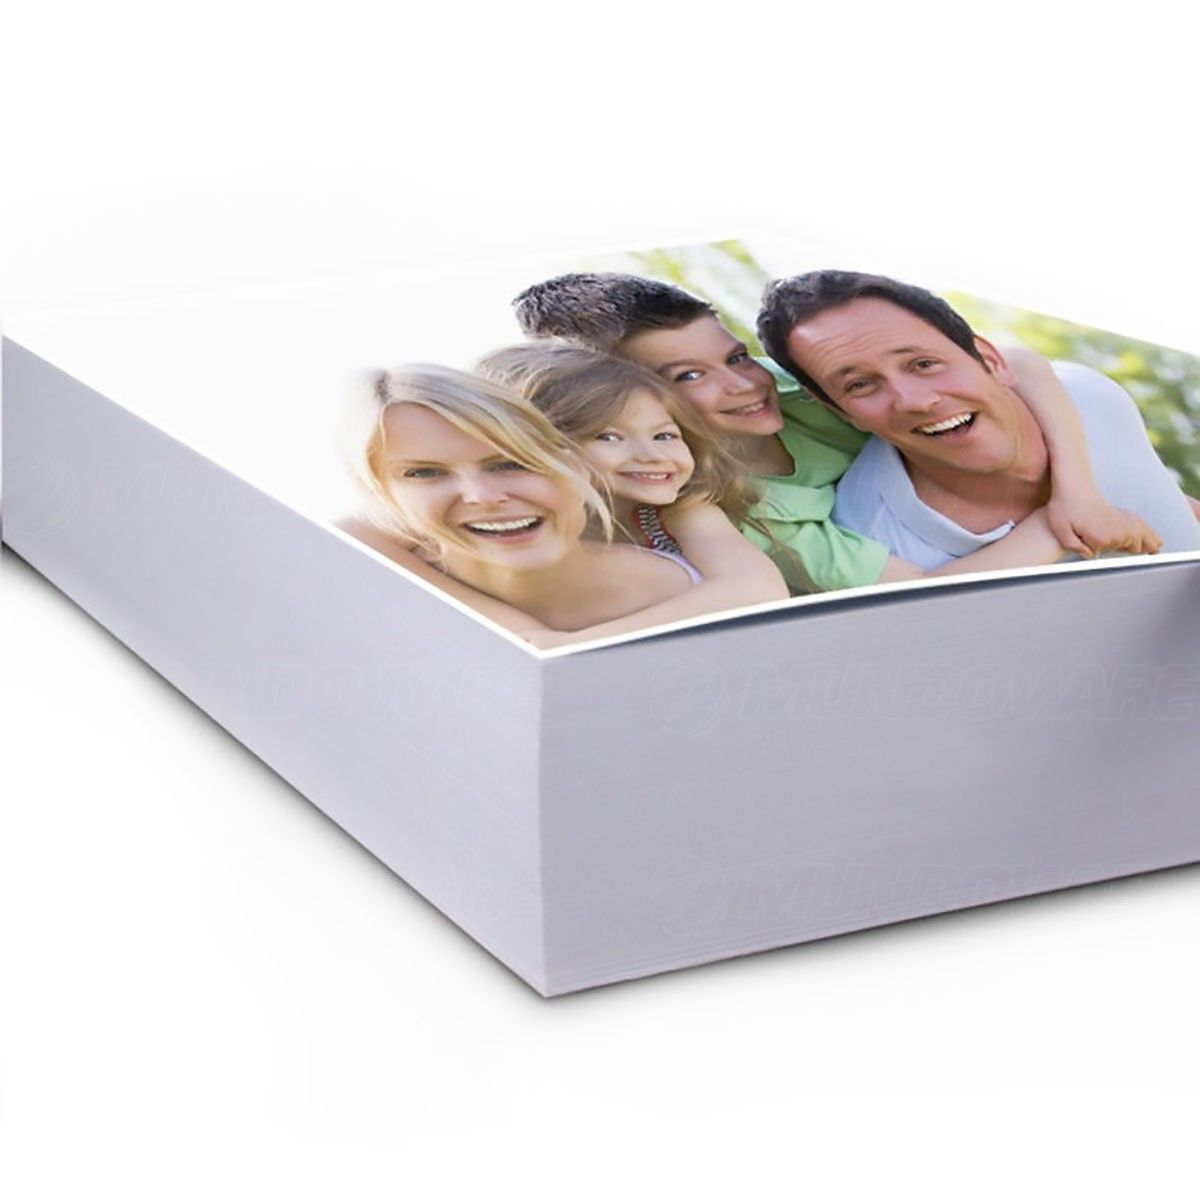 Papel Adesivo Fotográfico 115g A4 Branco Brilhante Resistente à Água / 1000 folhas